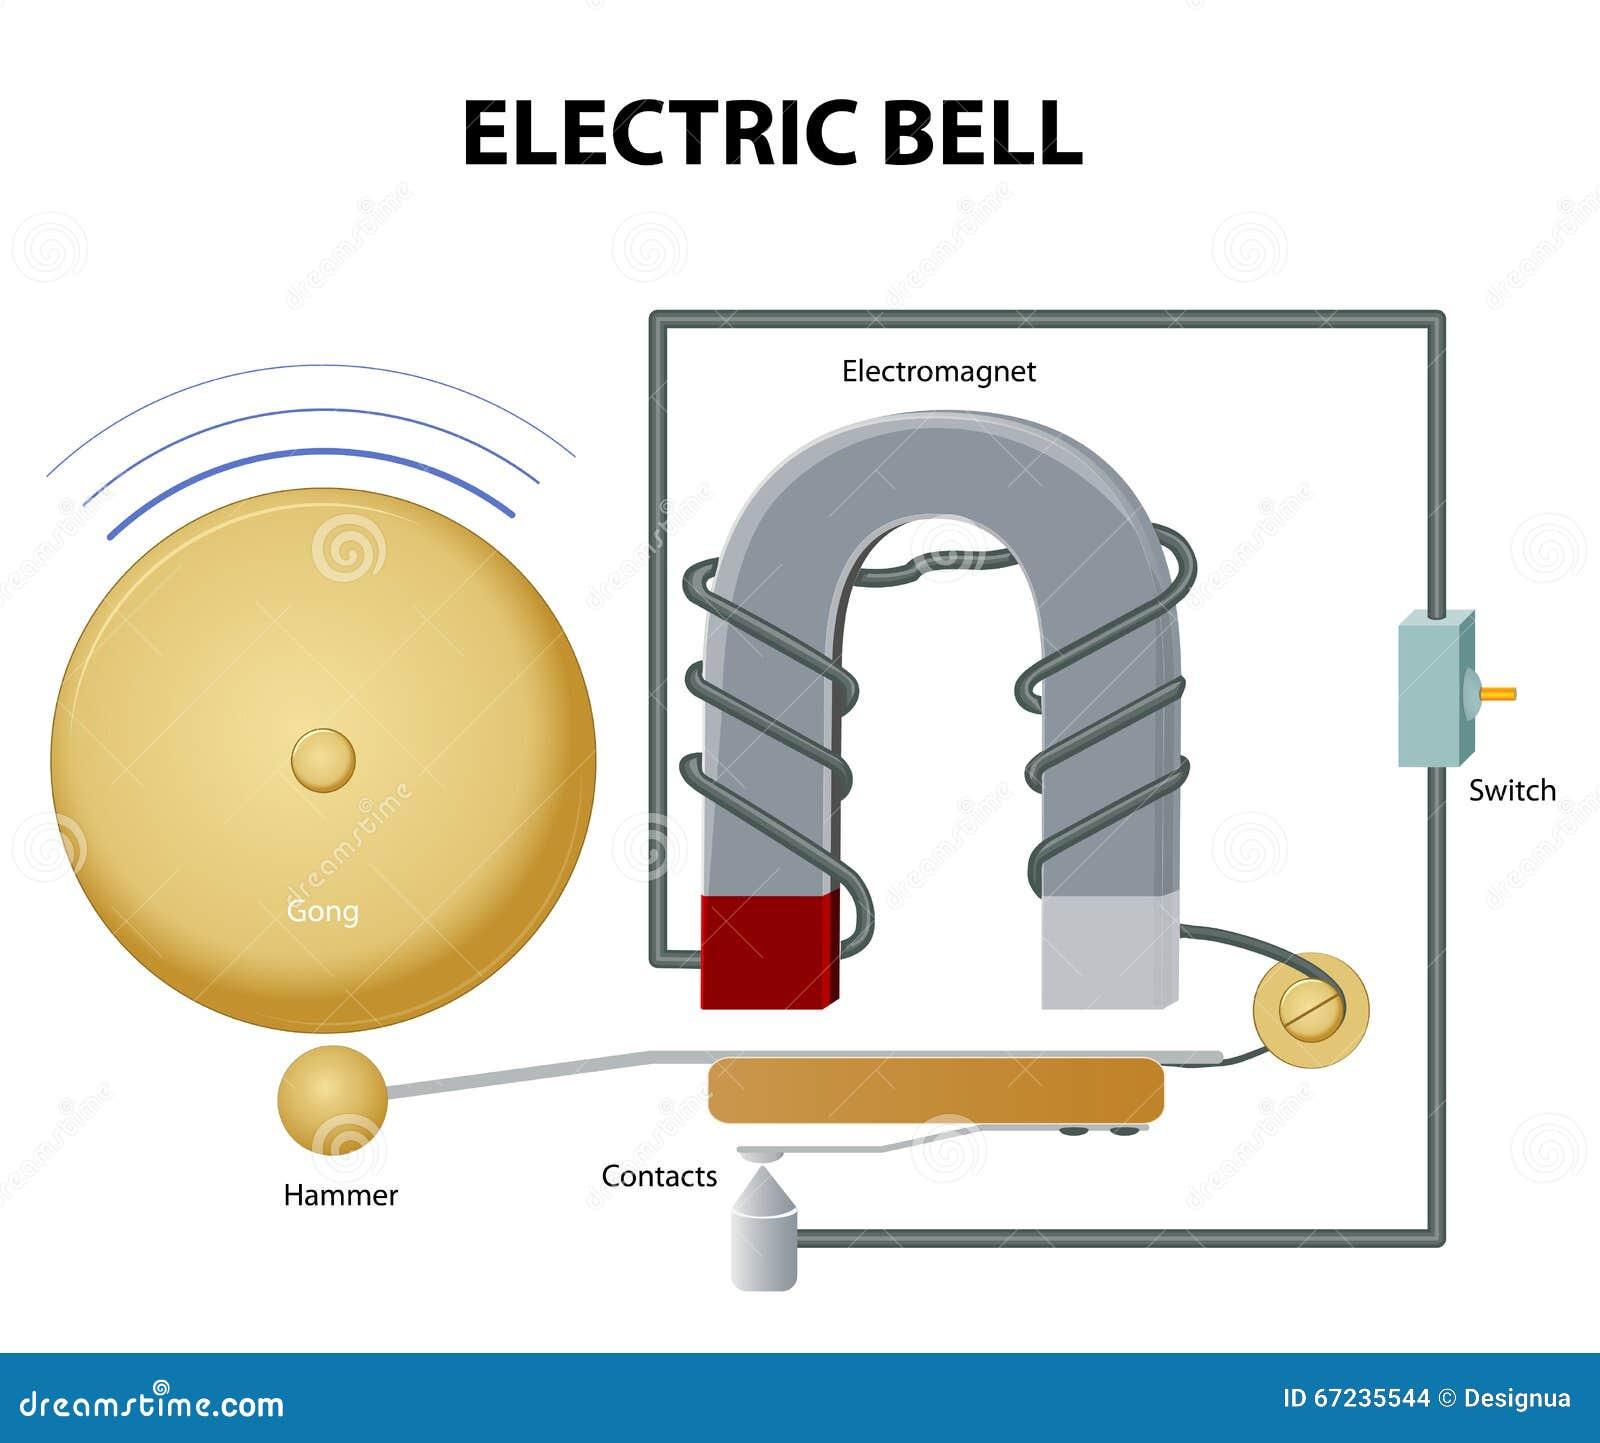 Electric Piston Diagram Electrical Wiring Block Bell Hydraulic Cylinder Car